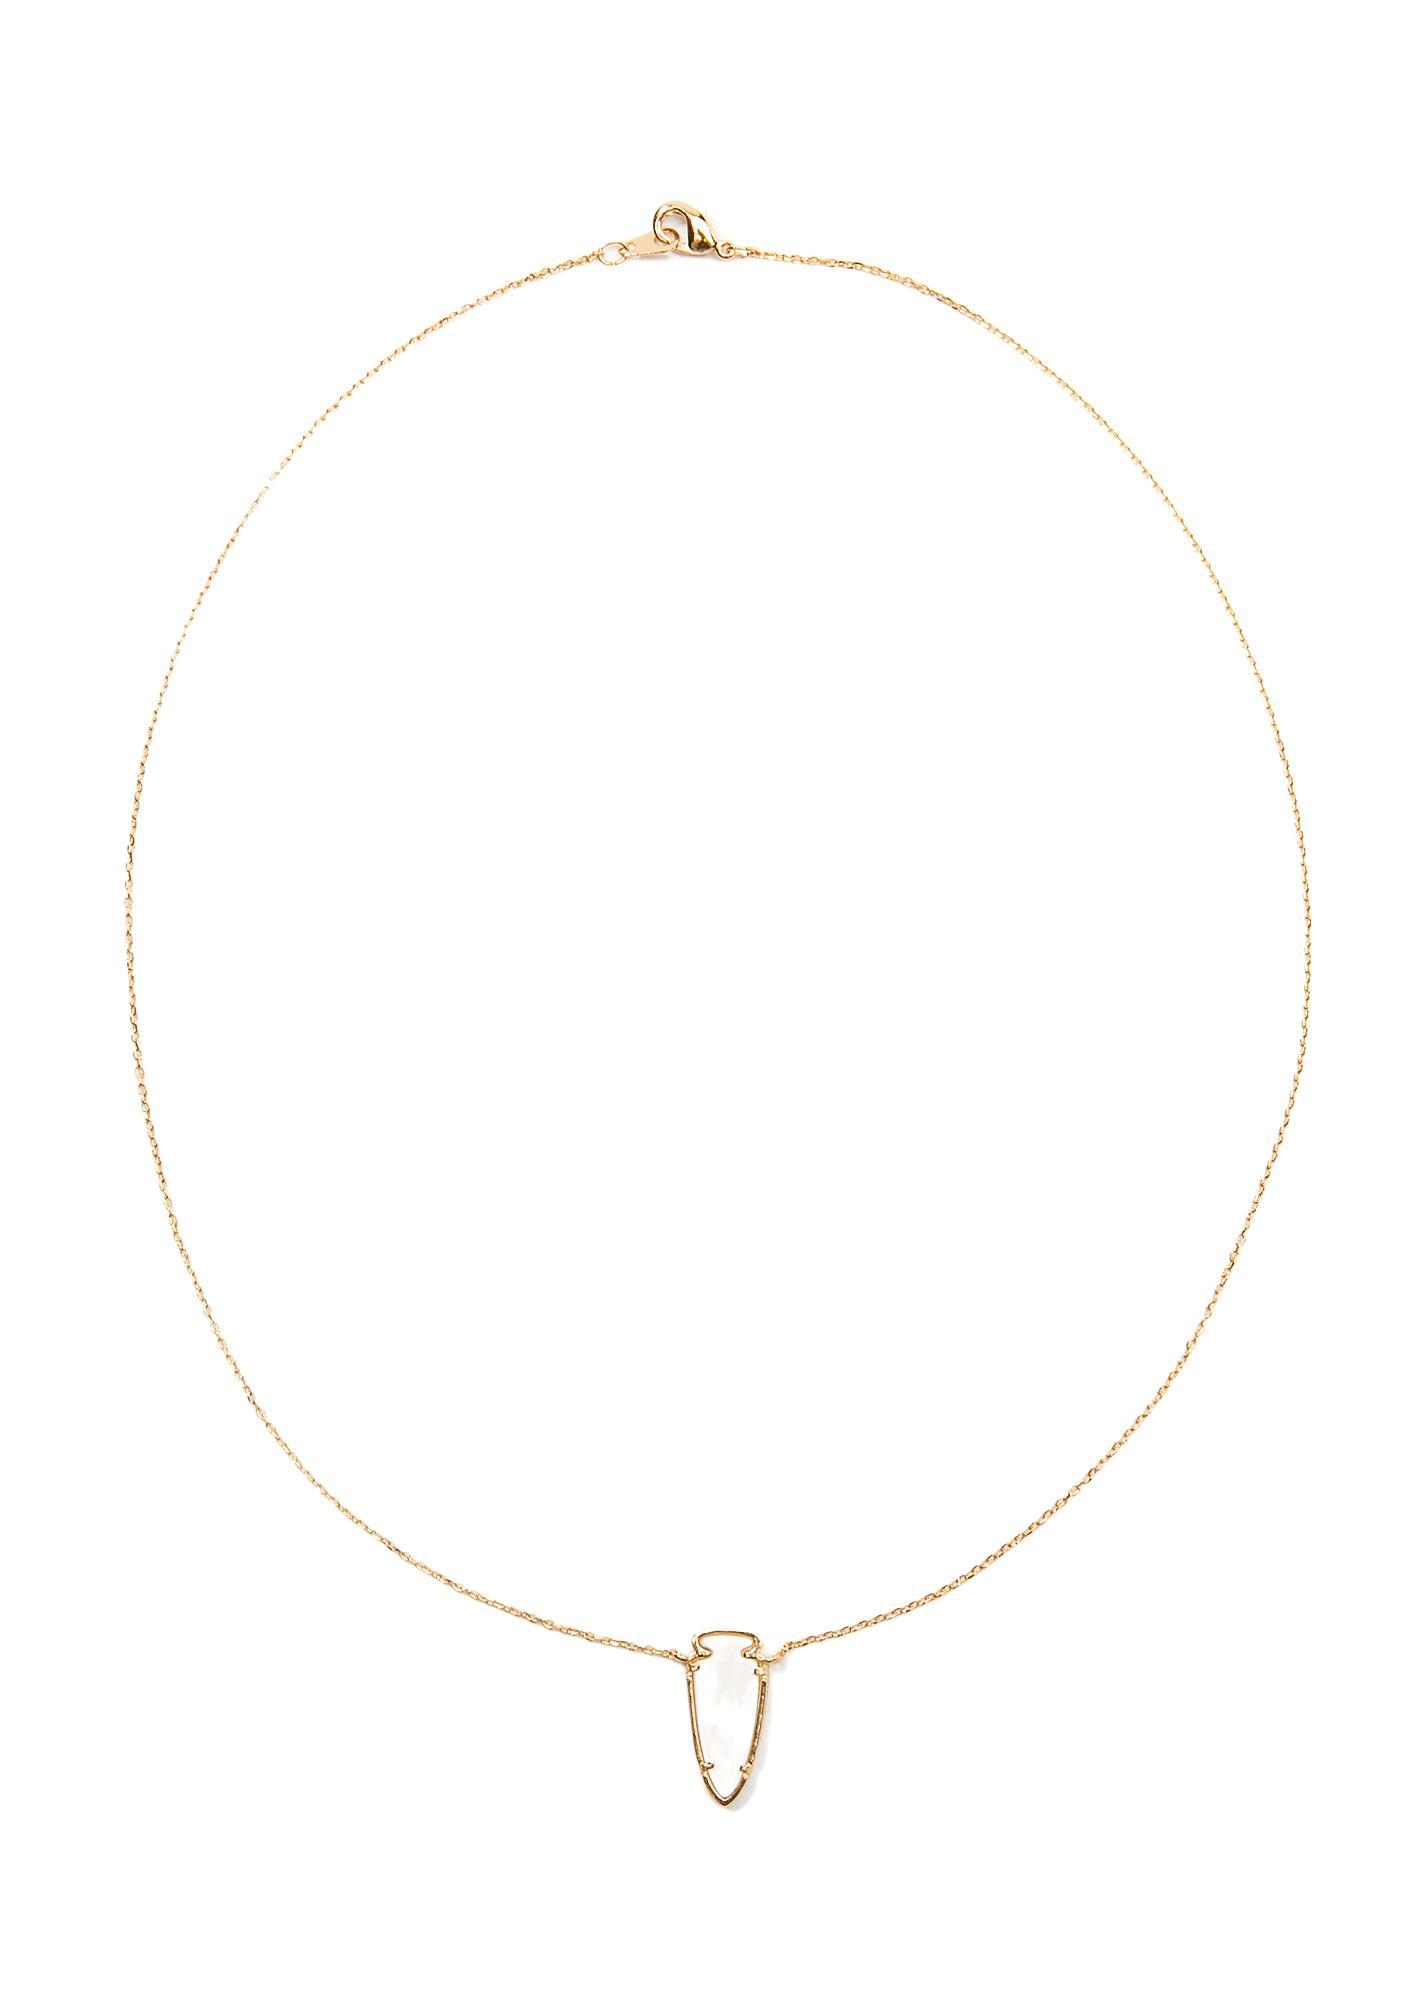 Elegance Dainty Pendant Necklace